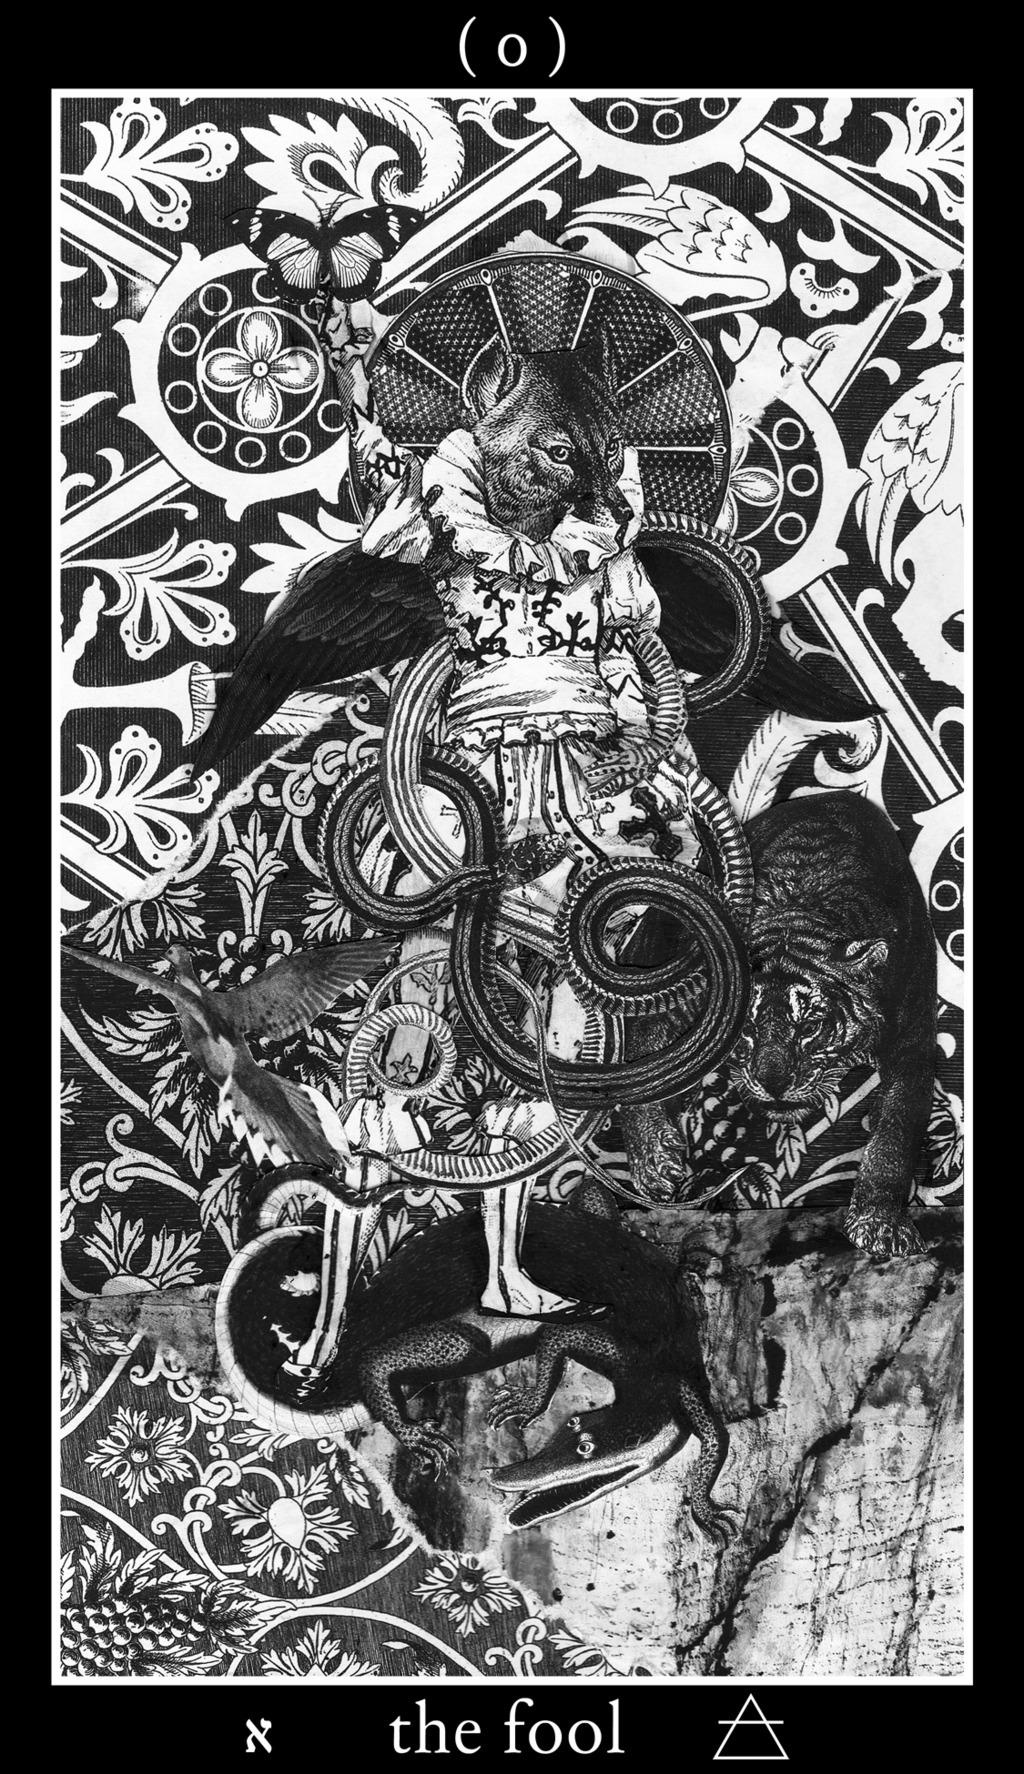 tarot - major arcana - the fool